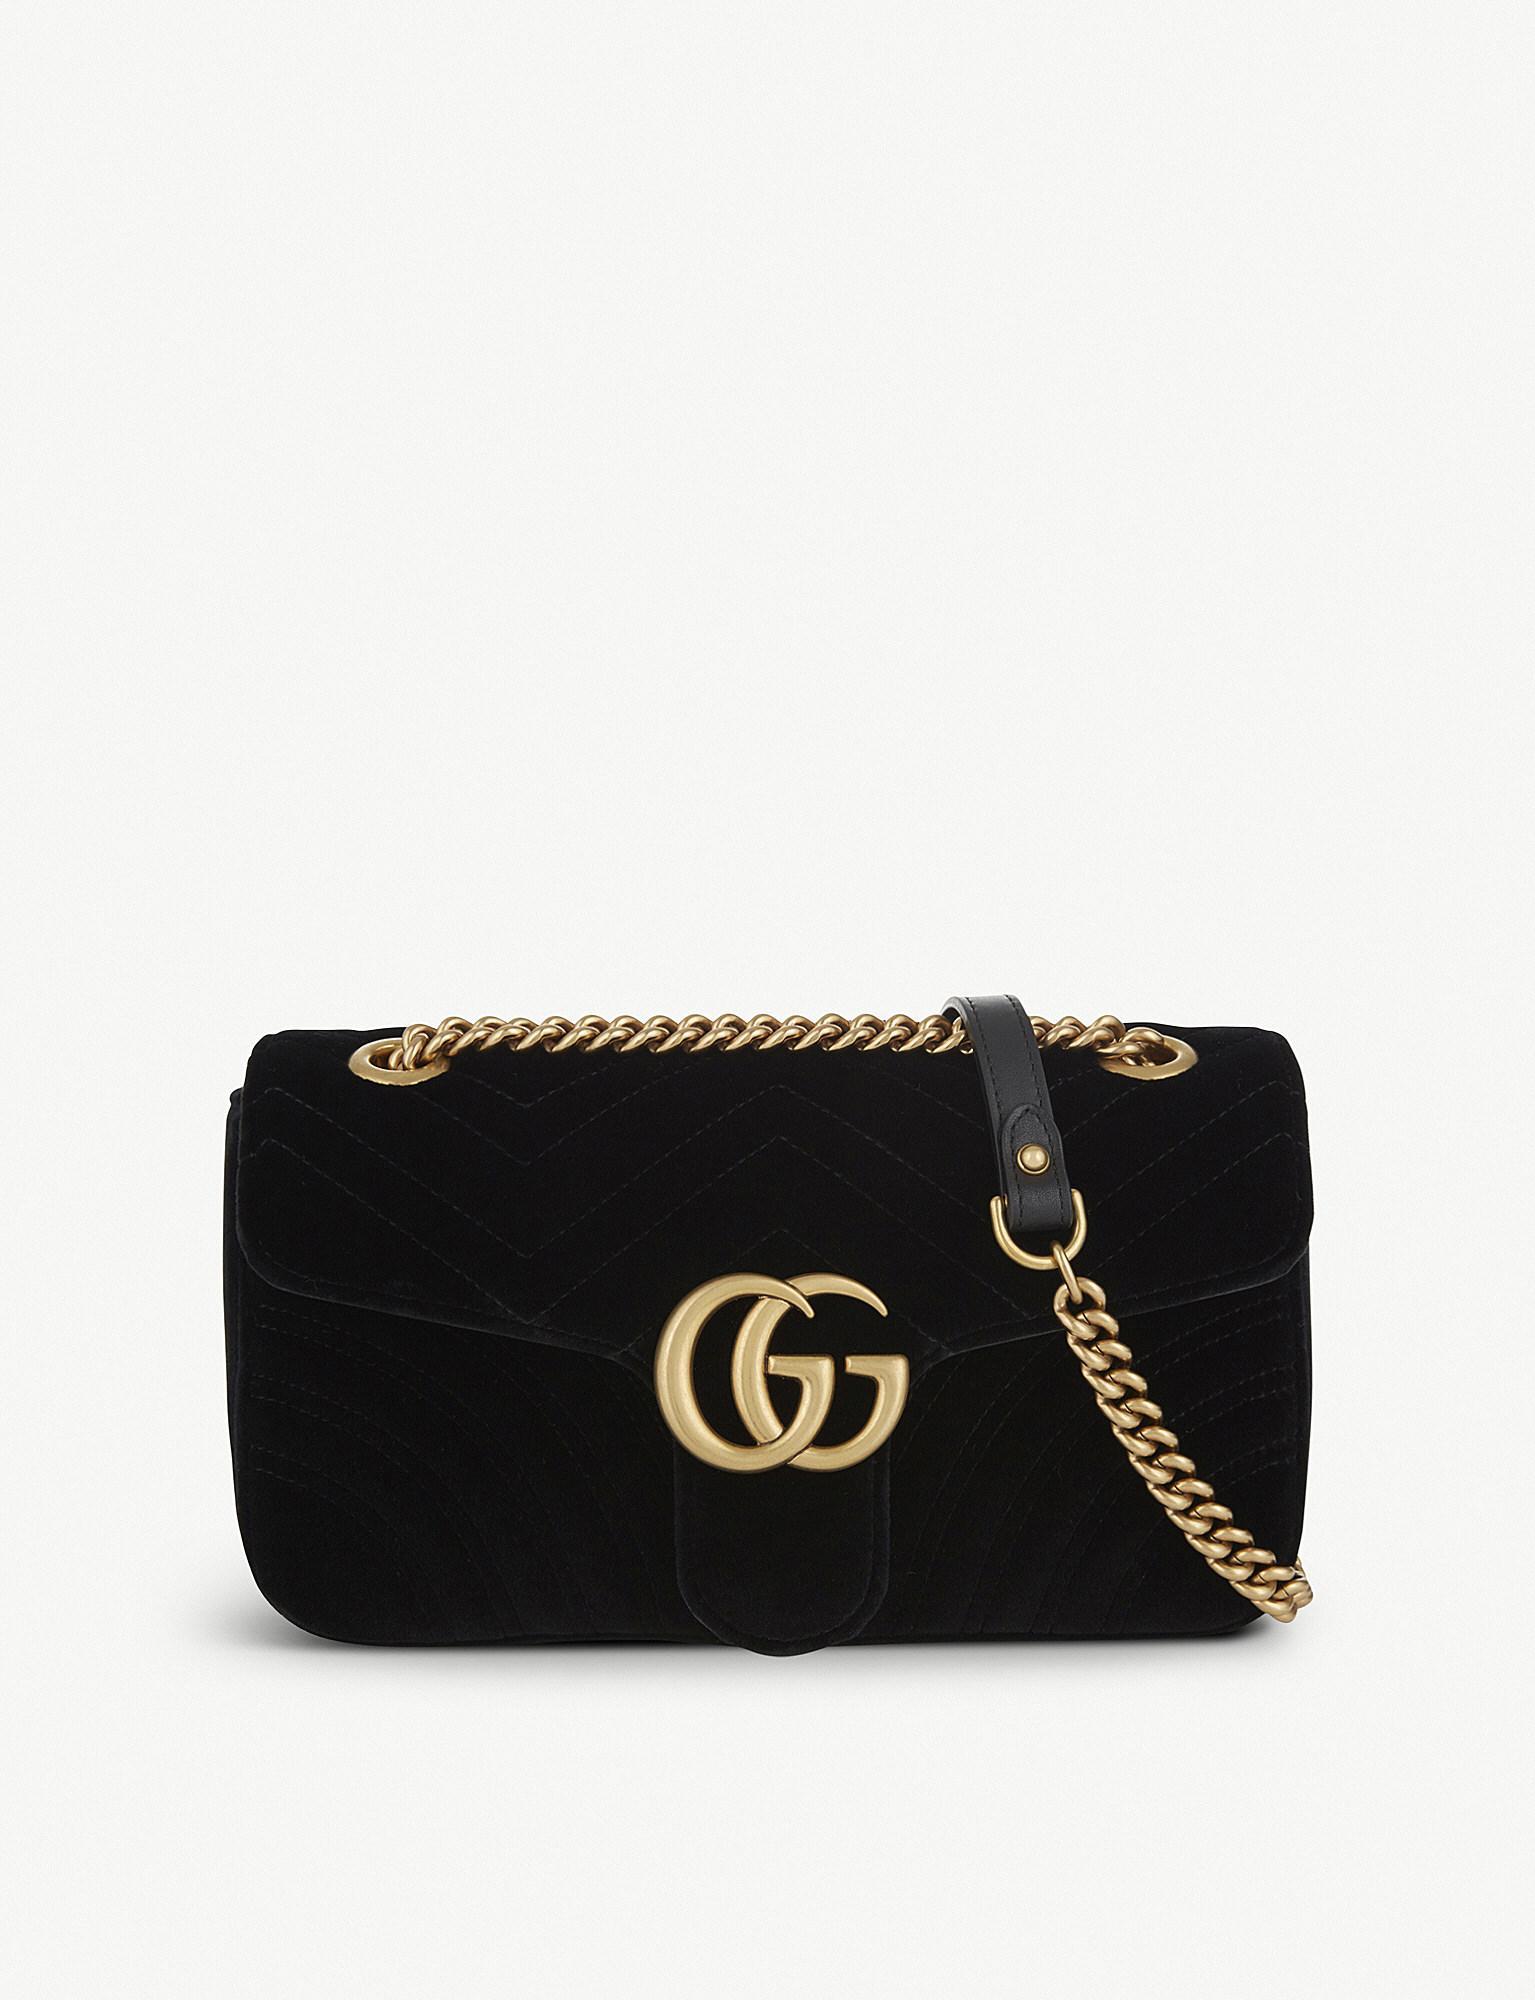 68cb16f686e4 Lyst Gucci Gg Marmont Small Velvet Shoulder Bag In Black Save